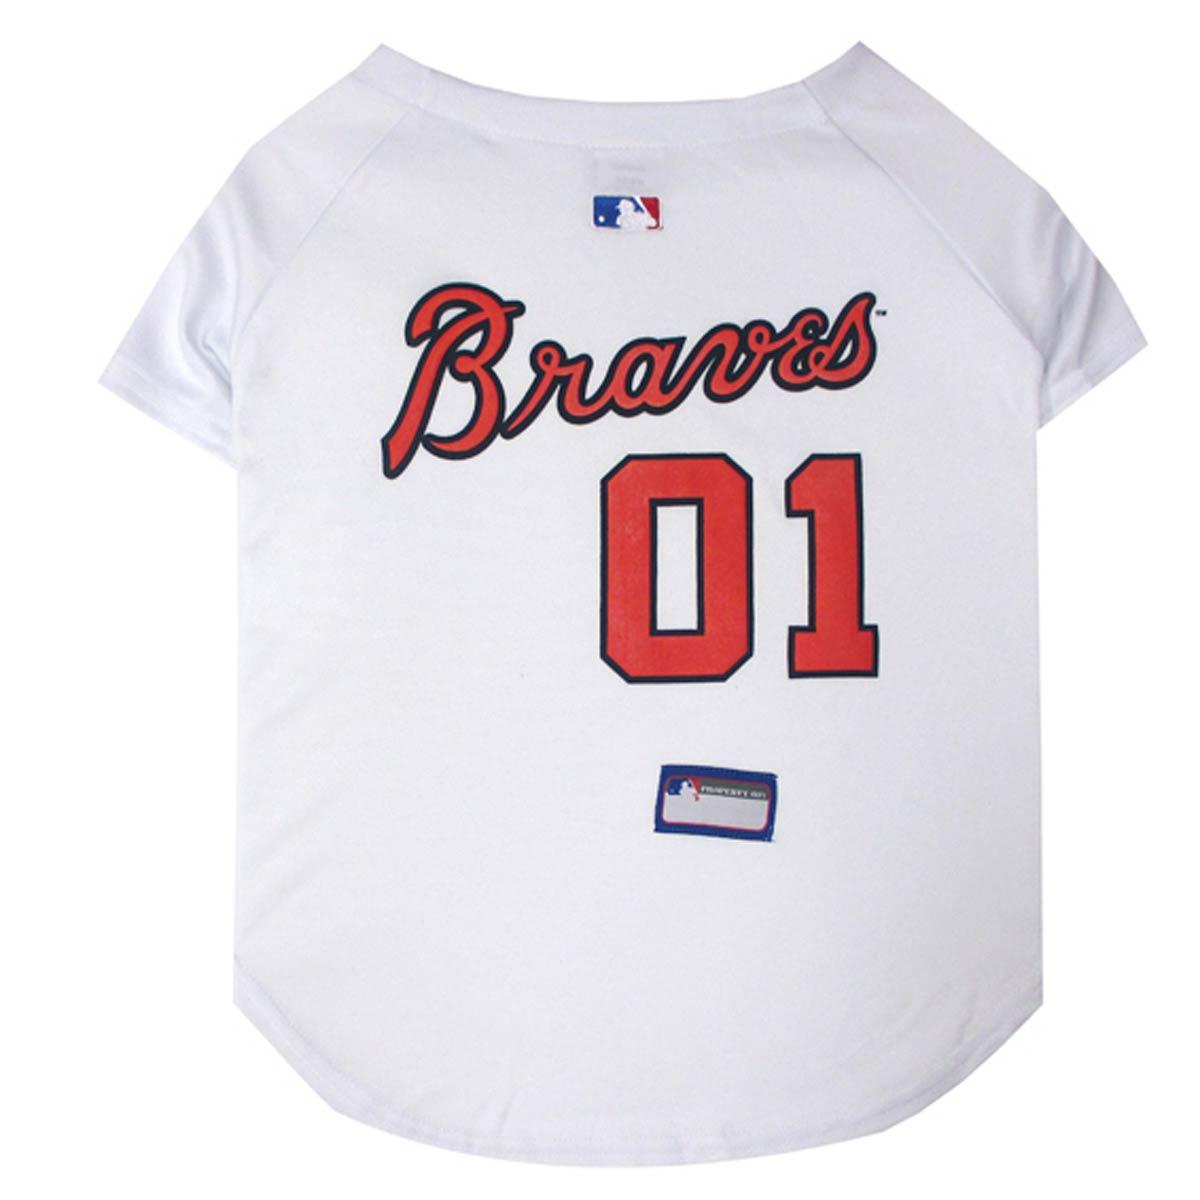 Atlanta Braves Officially Licensed Dog Jersey - White